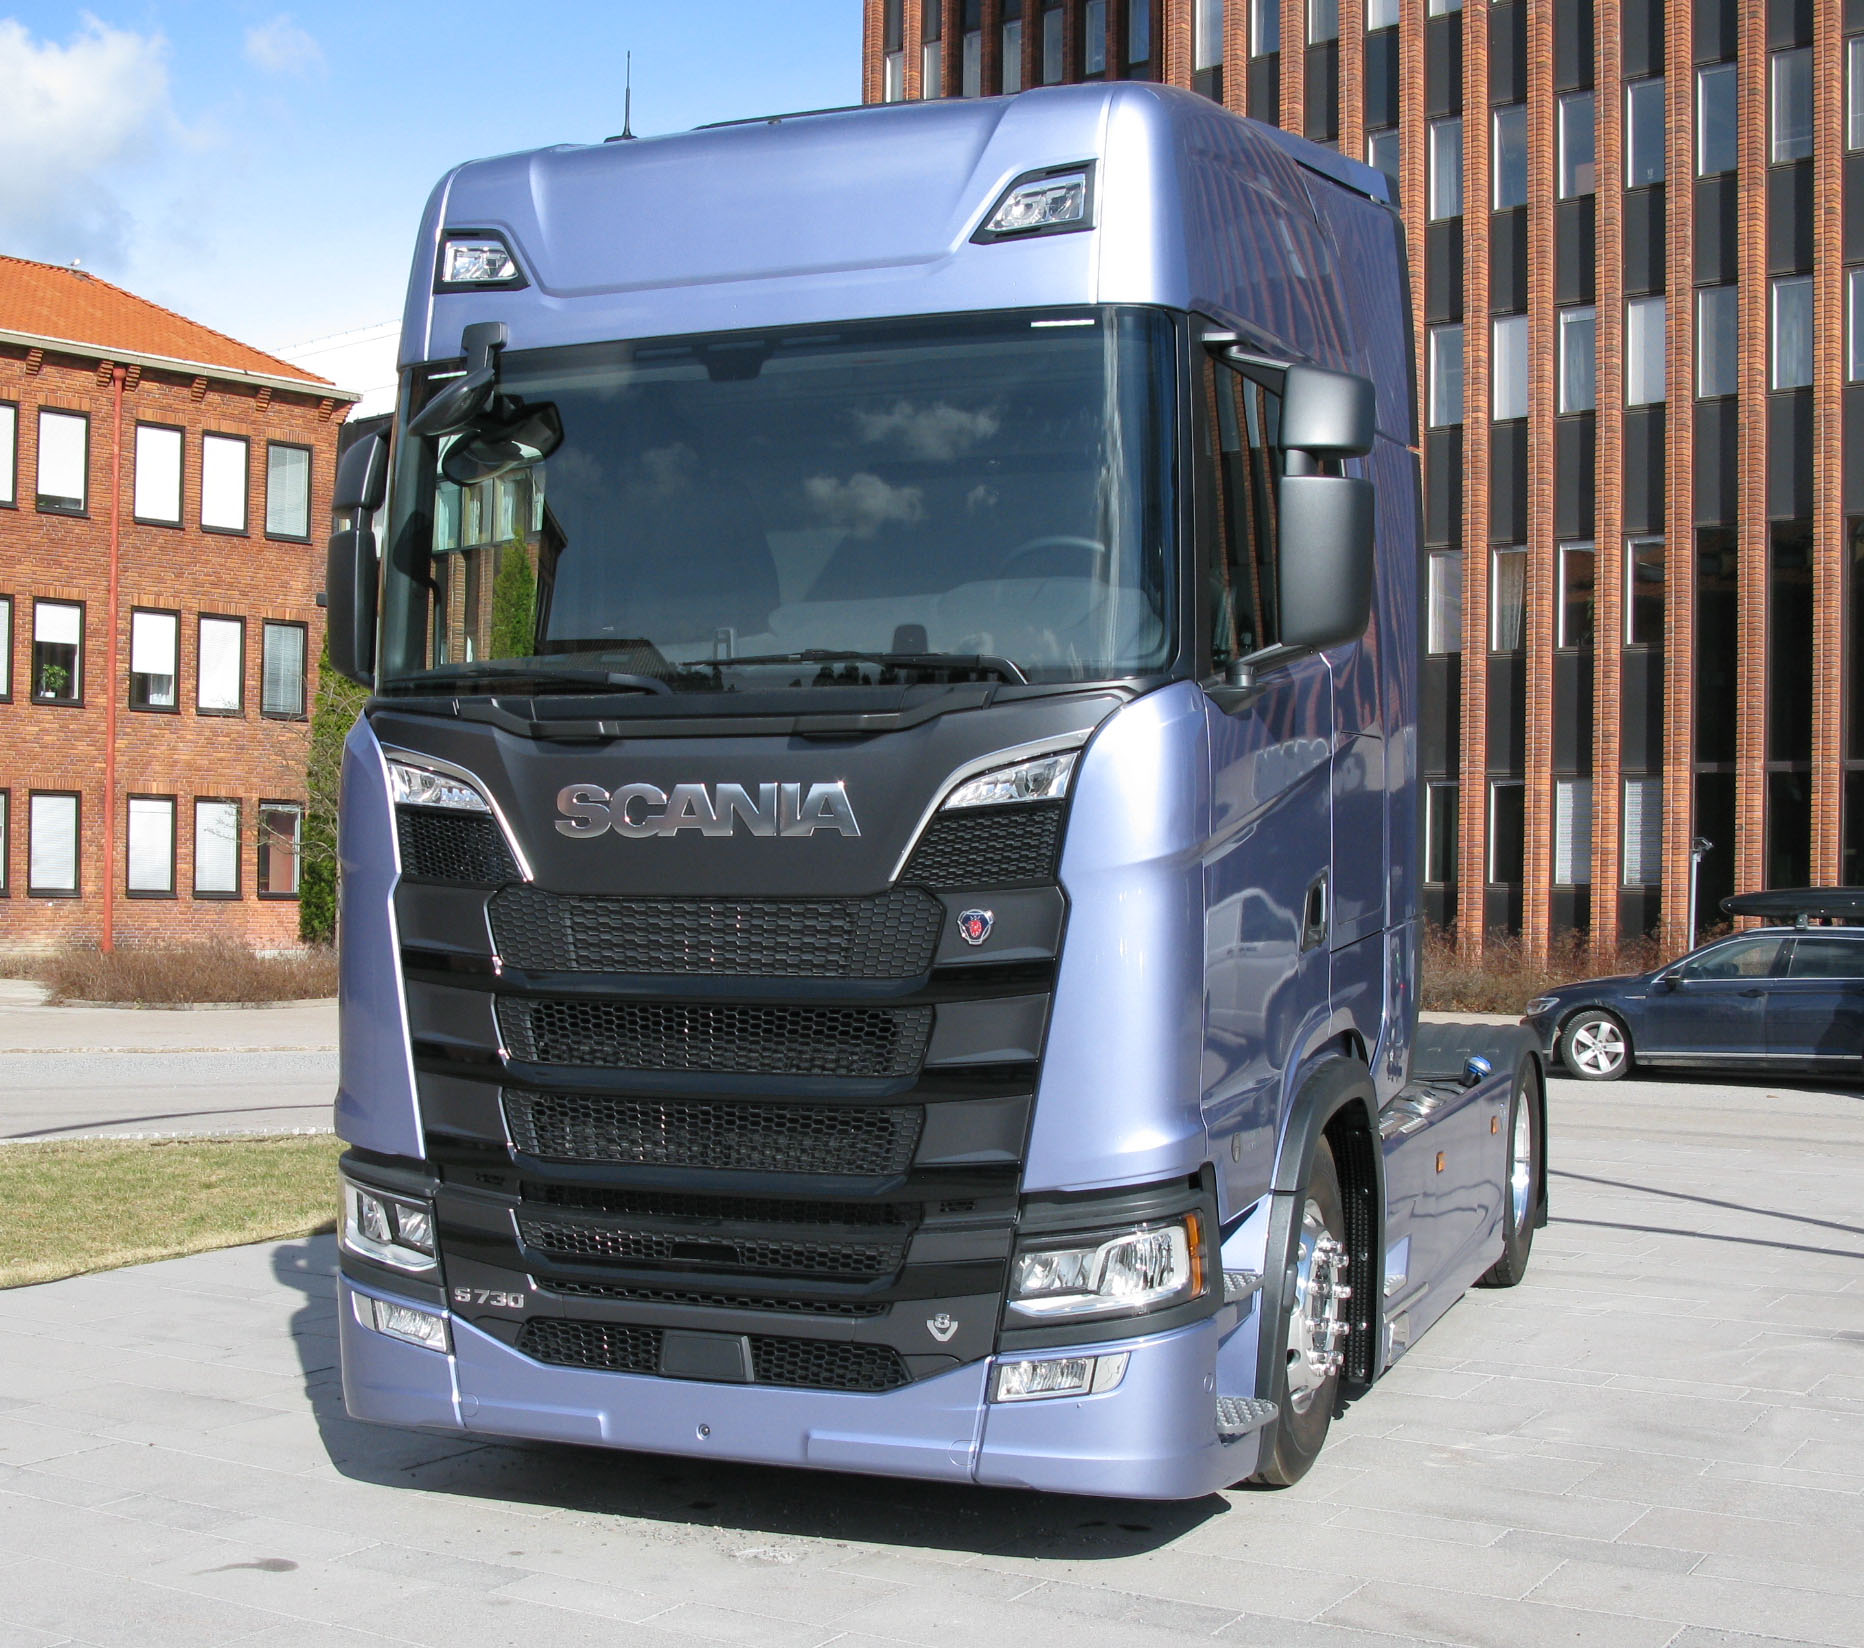 File:Scania S730 2 jpg - Wikimedia Commons